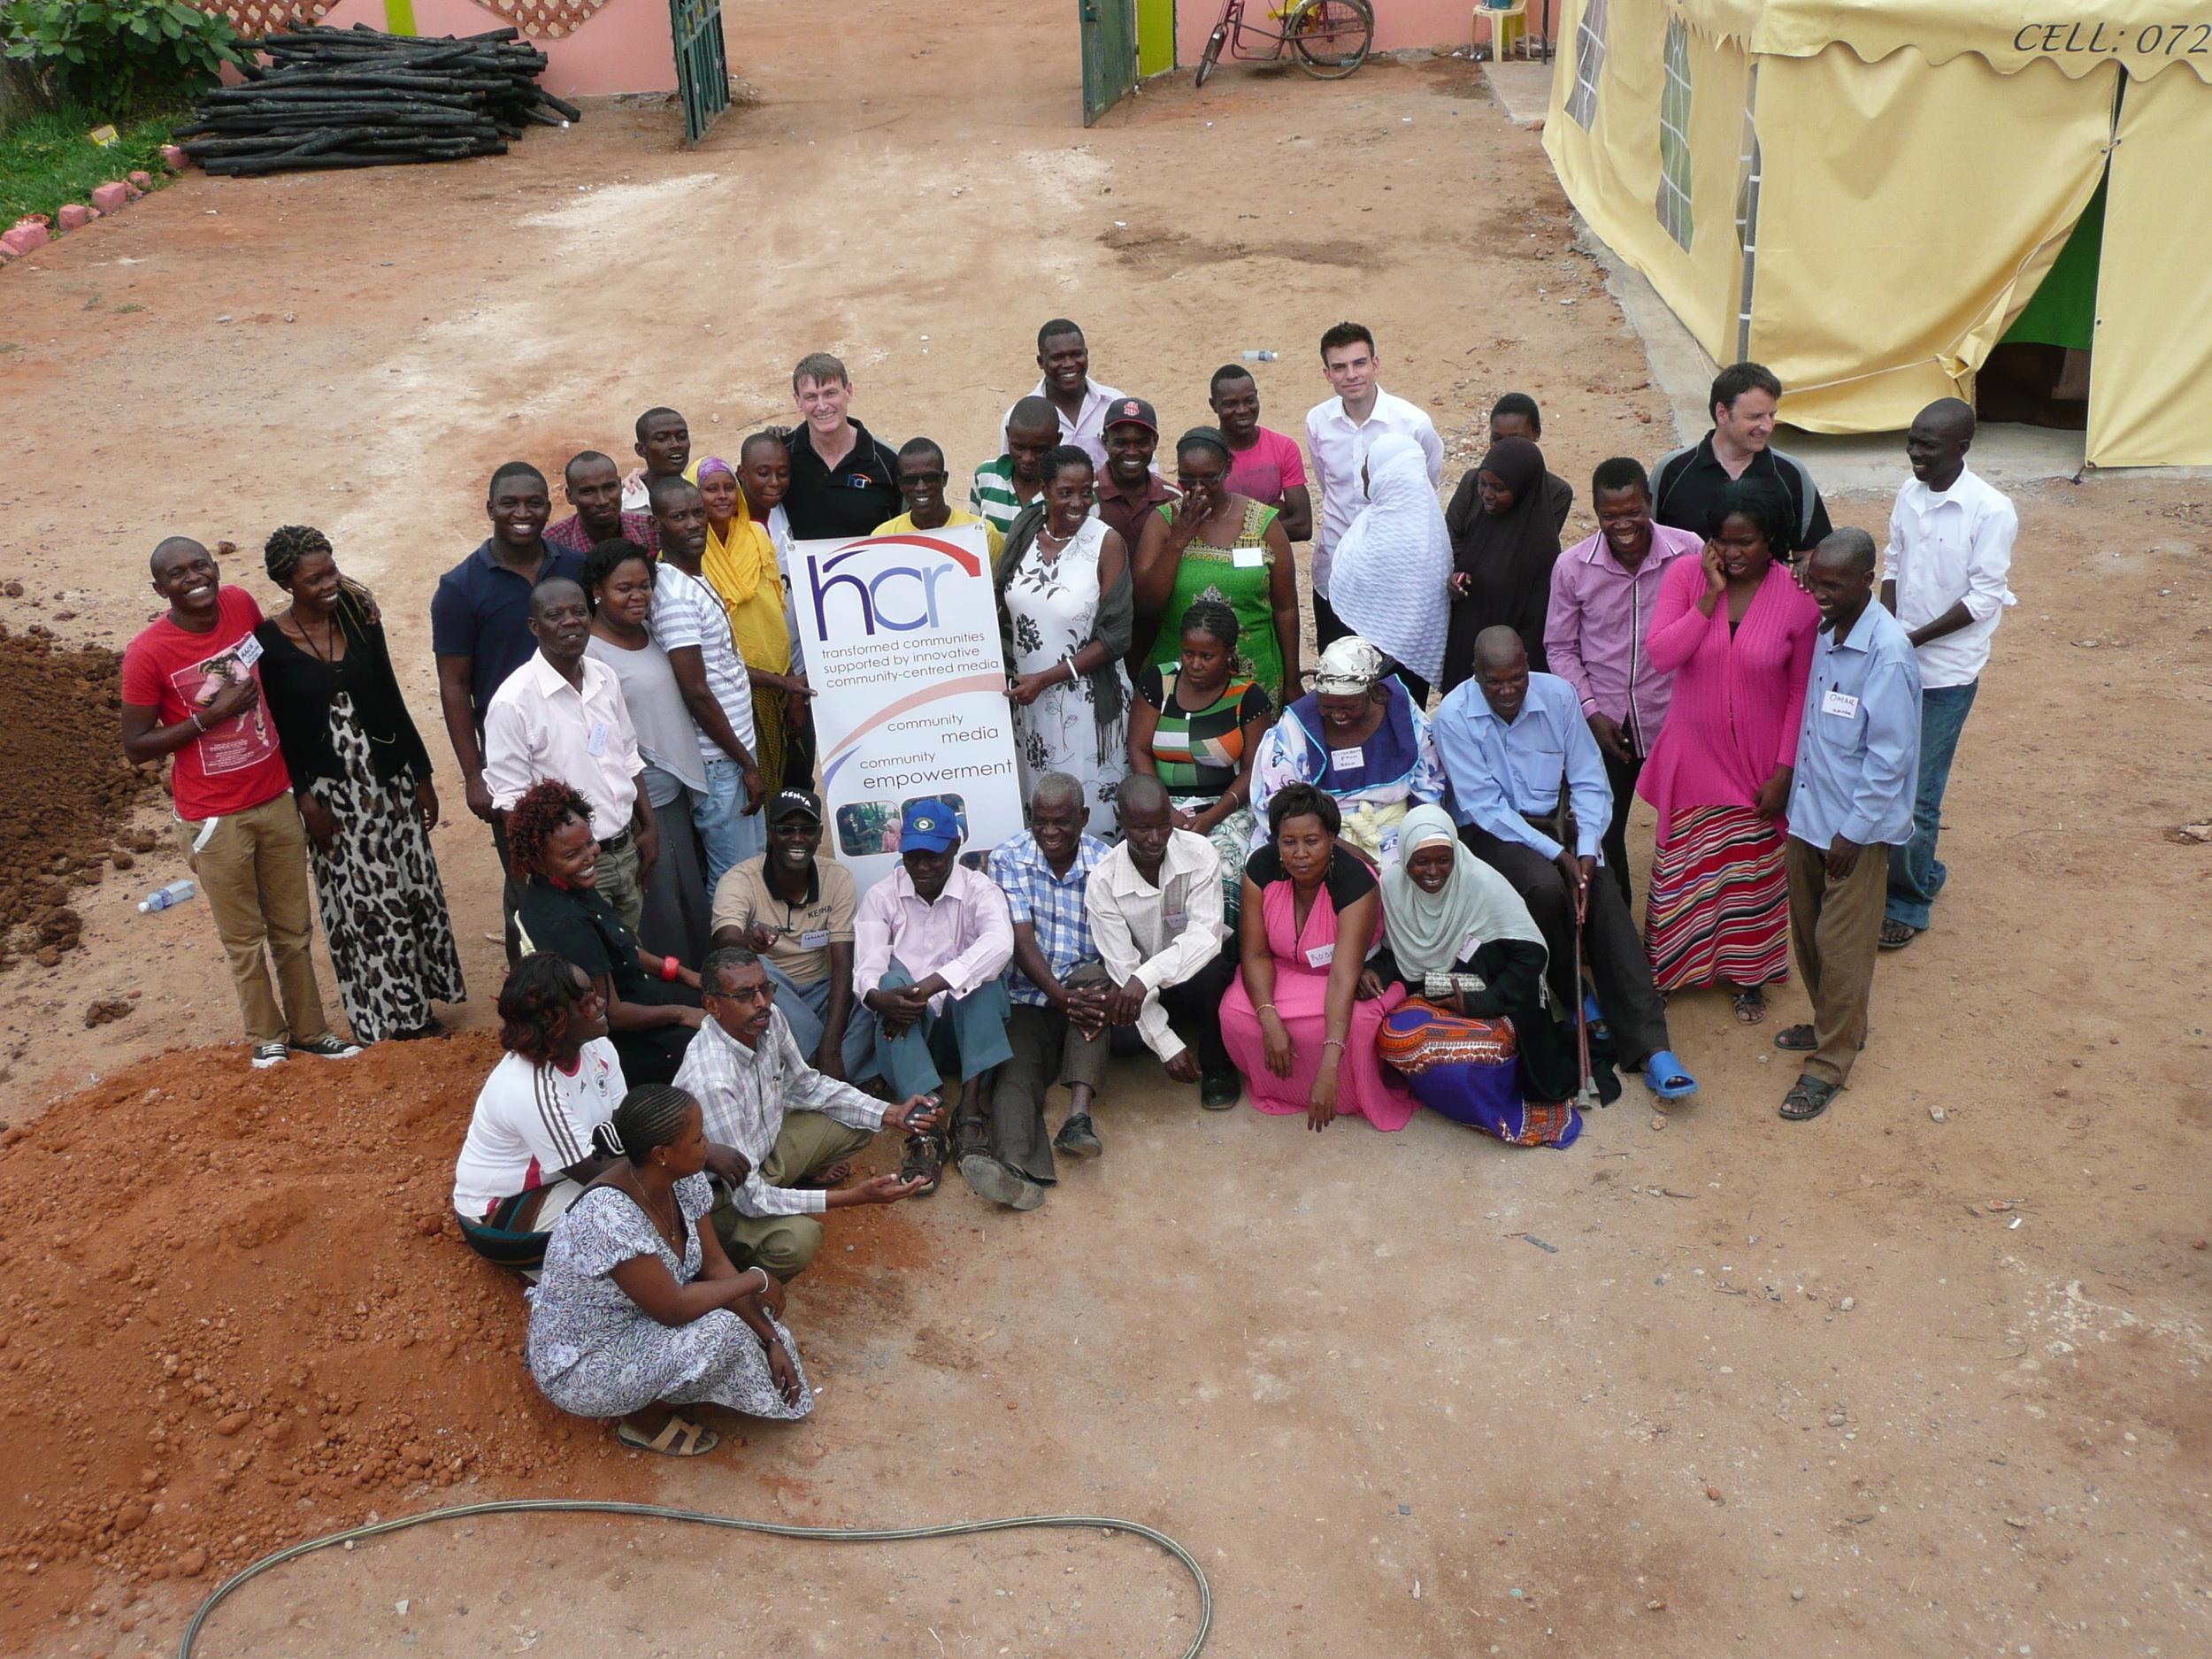 Jon, Alex and Alex with community members from Tana Delta, Kenya.